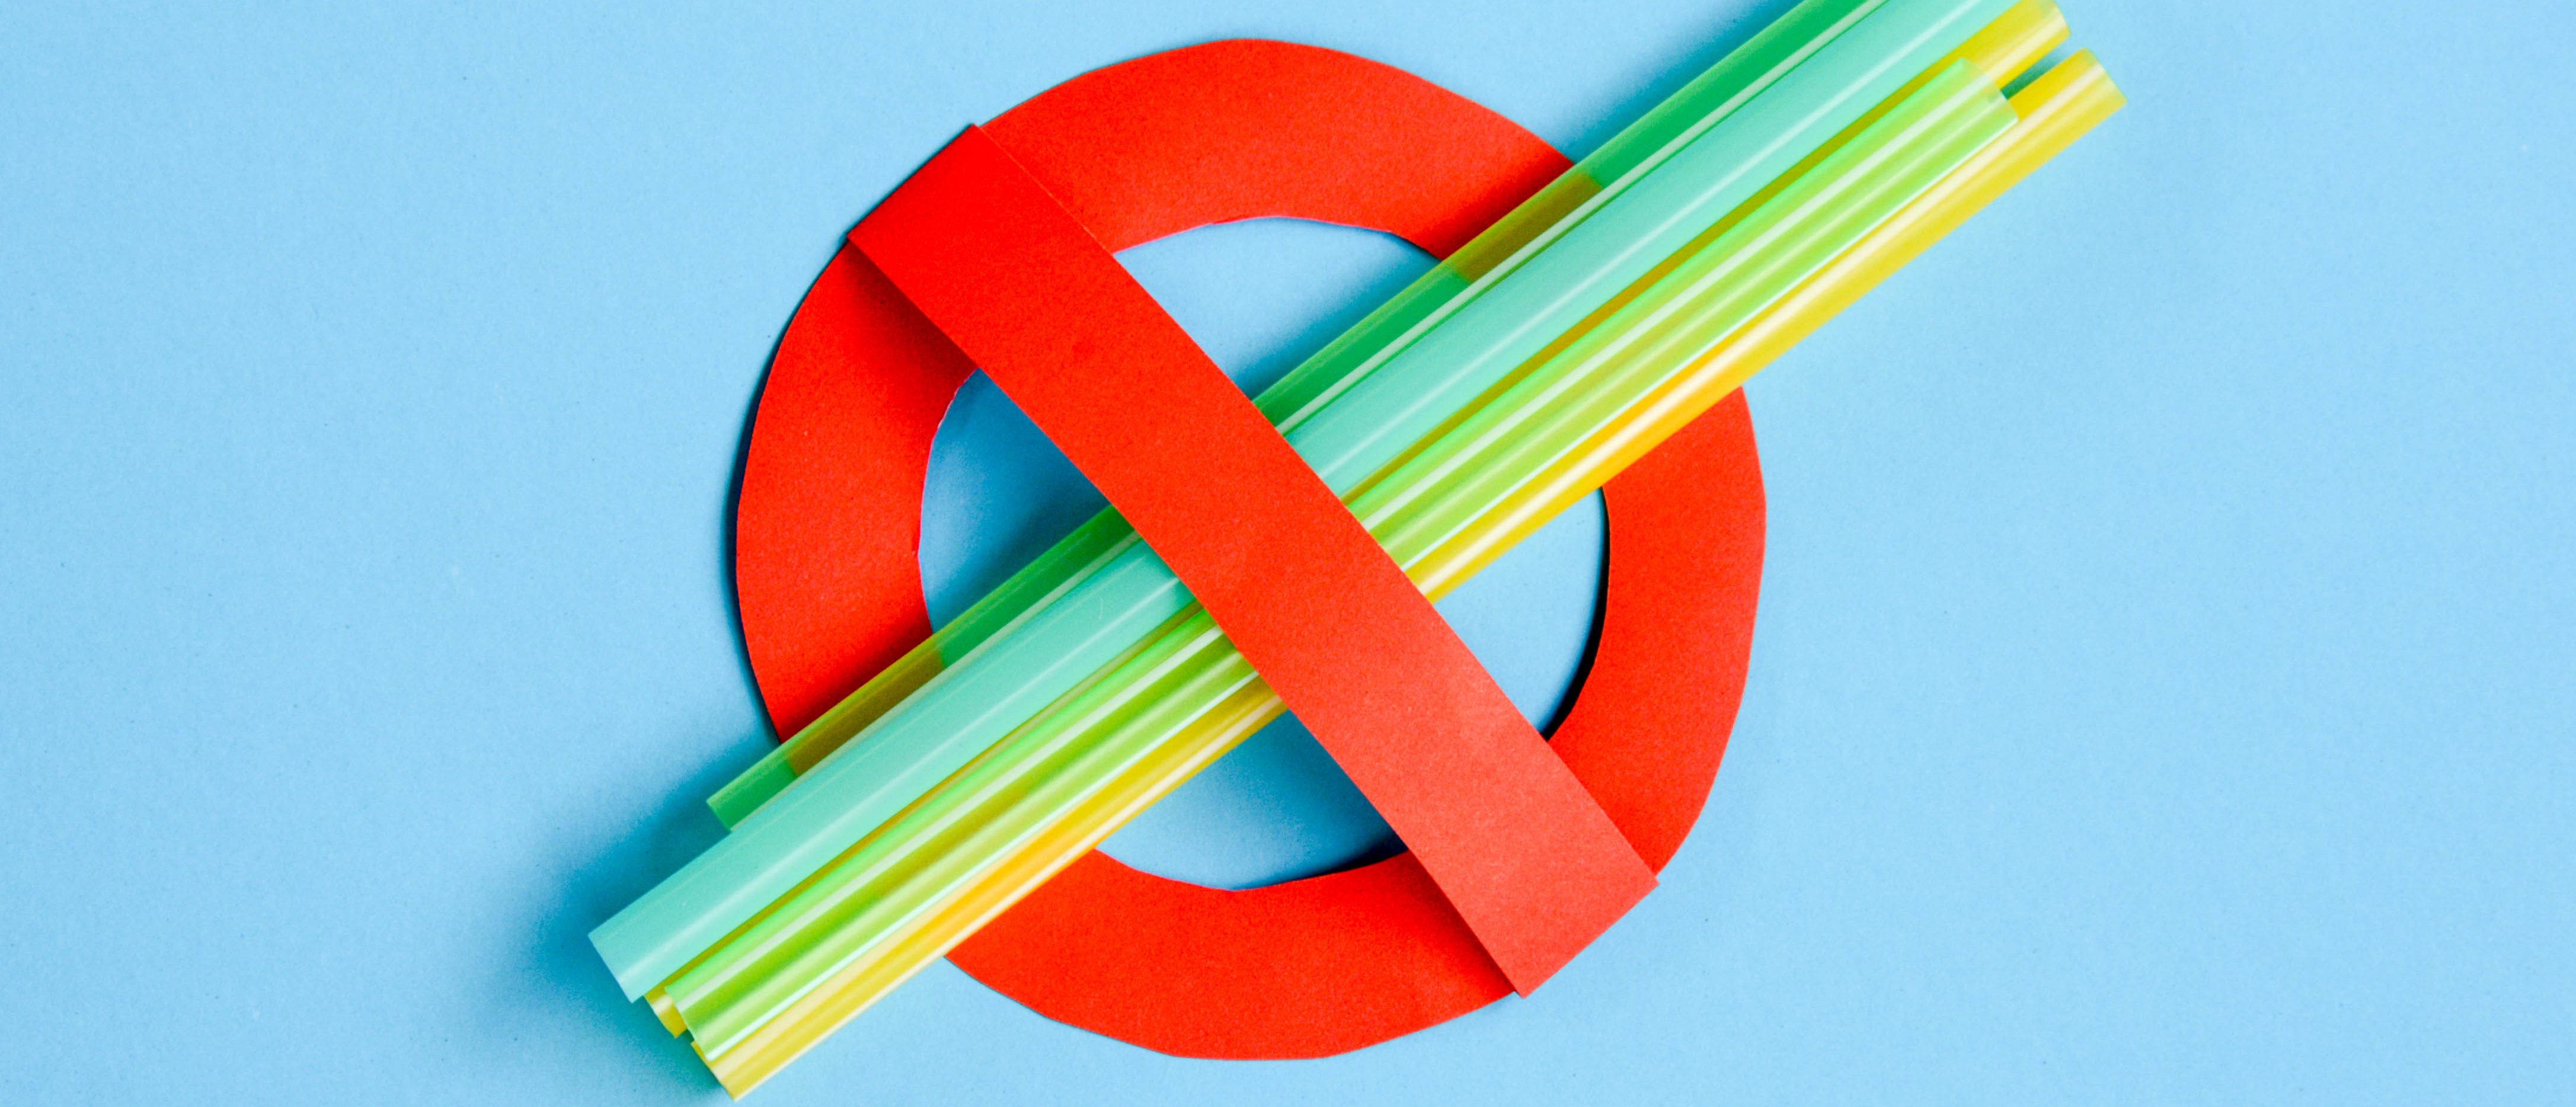 Straw ban, Shutterstock/ By Kanittha Boon